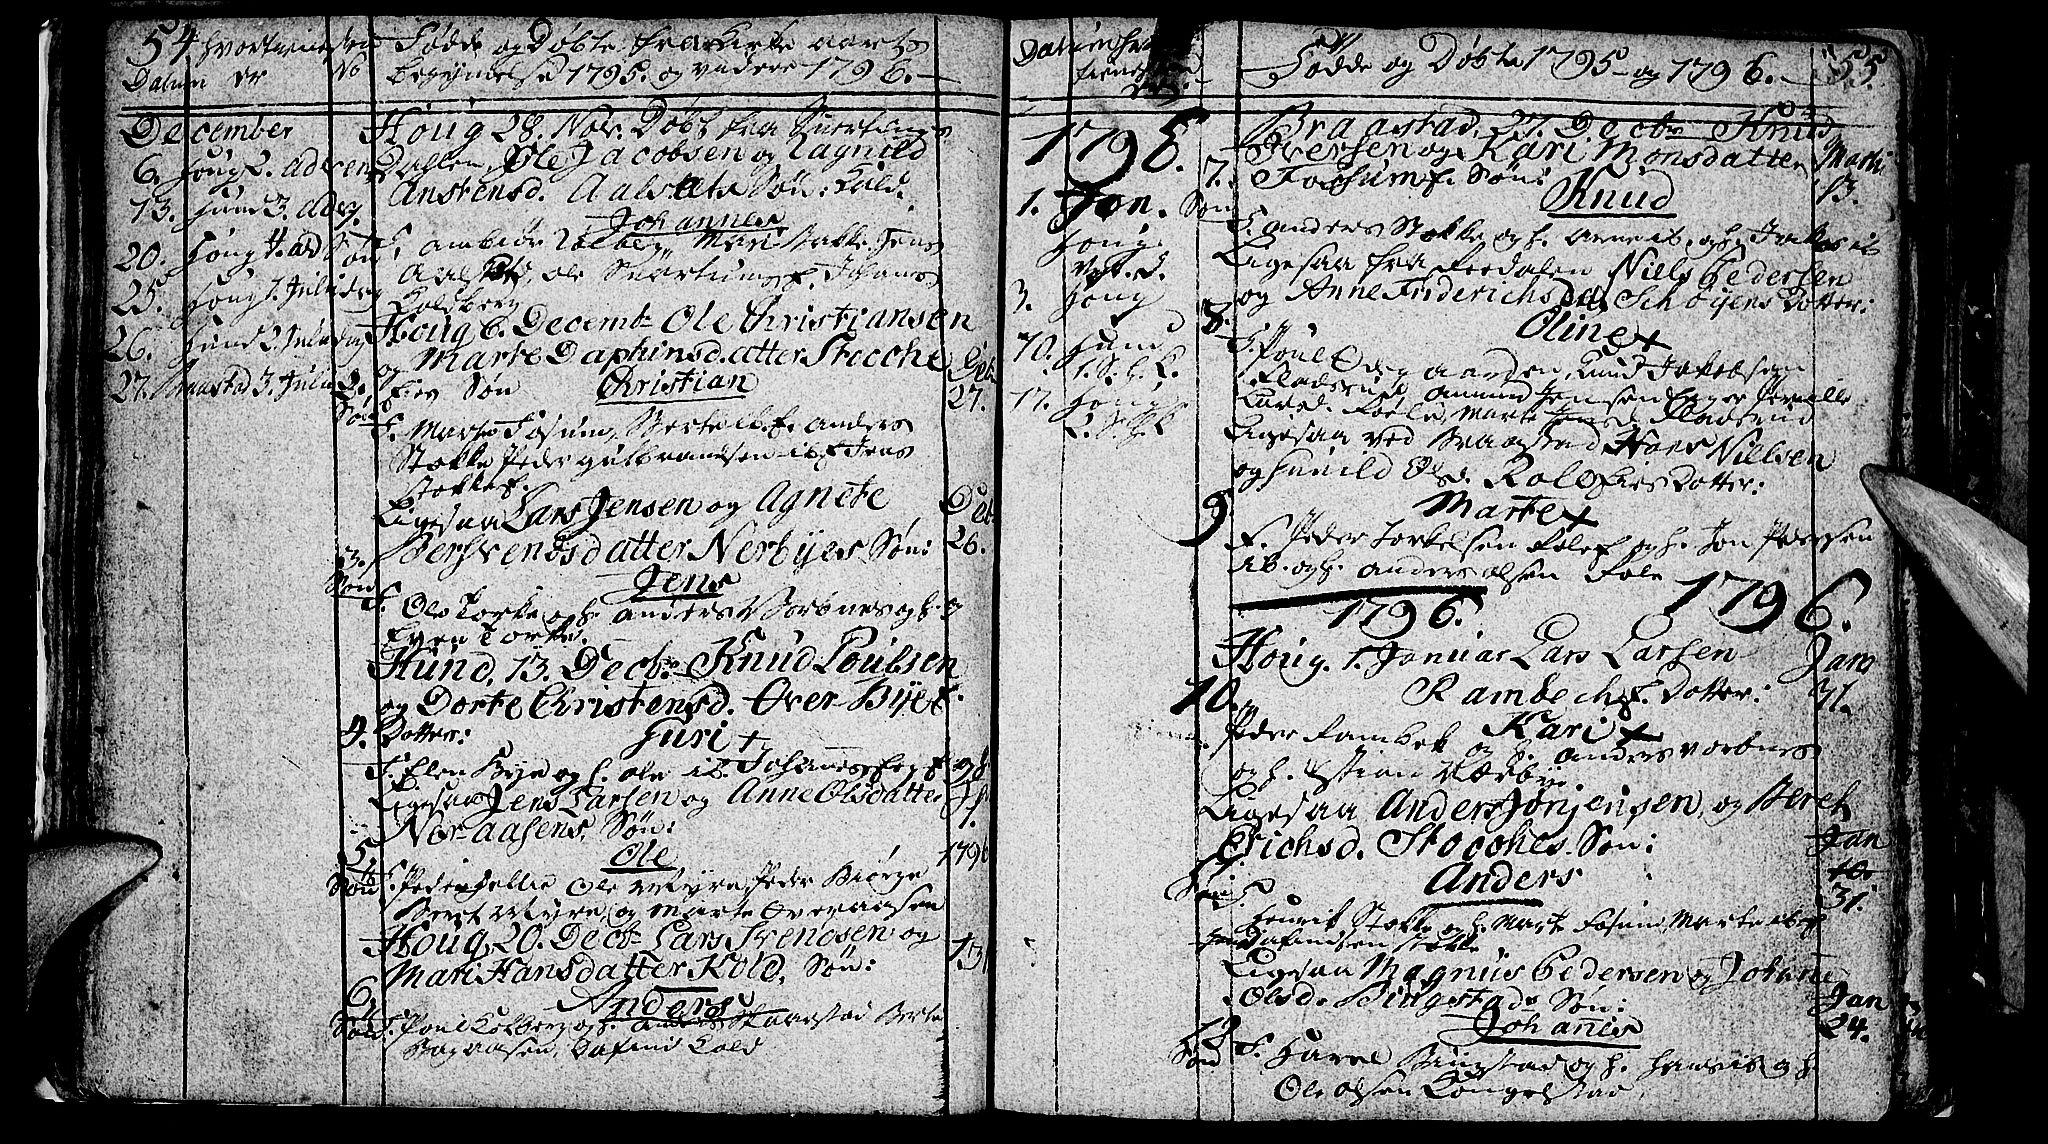 SAH, Vardal prestekontor, H/Ha/Hab/L0002: Klokkerbok nr. 2, 1790-1803, s. 54-55